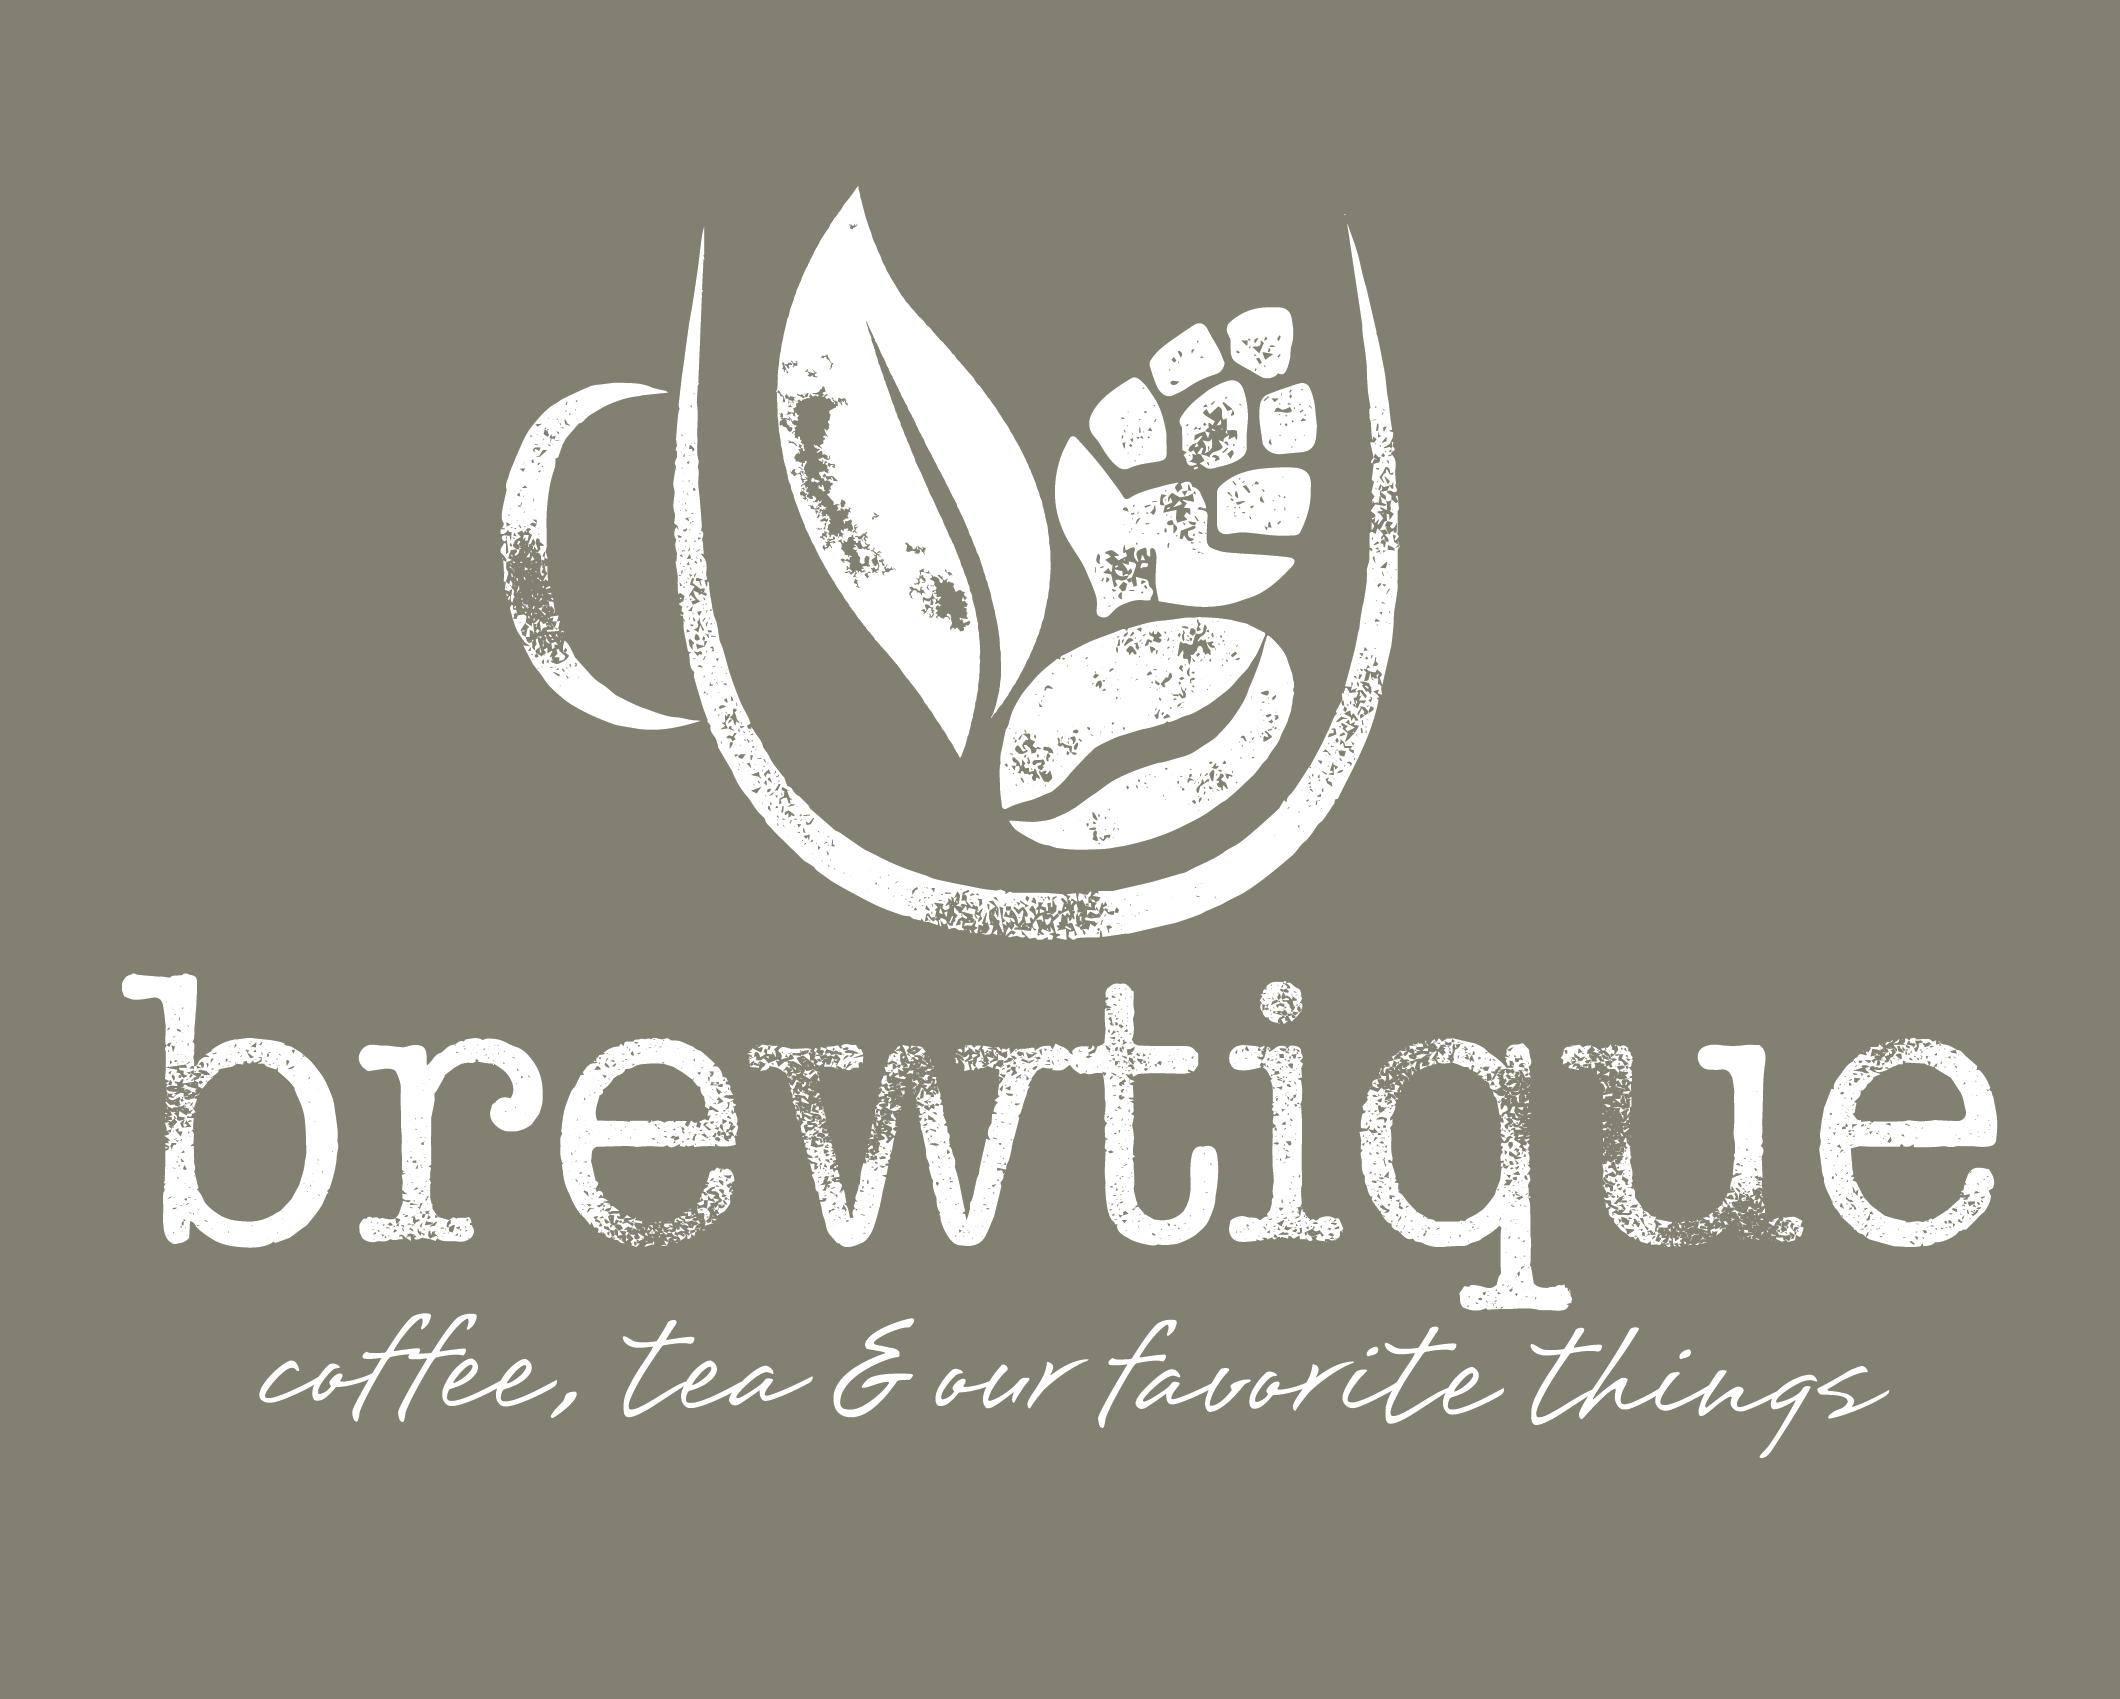 brewtique2017distressedrev_crop_(1).png